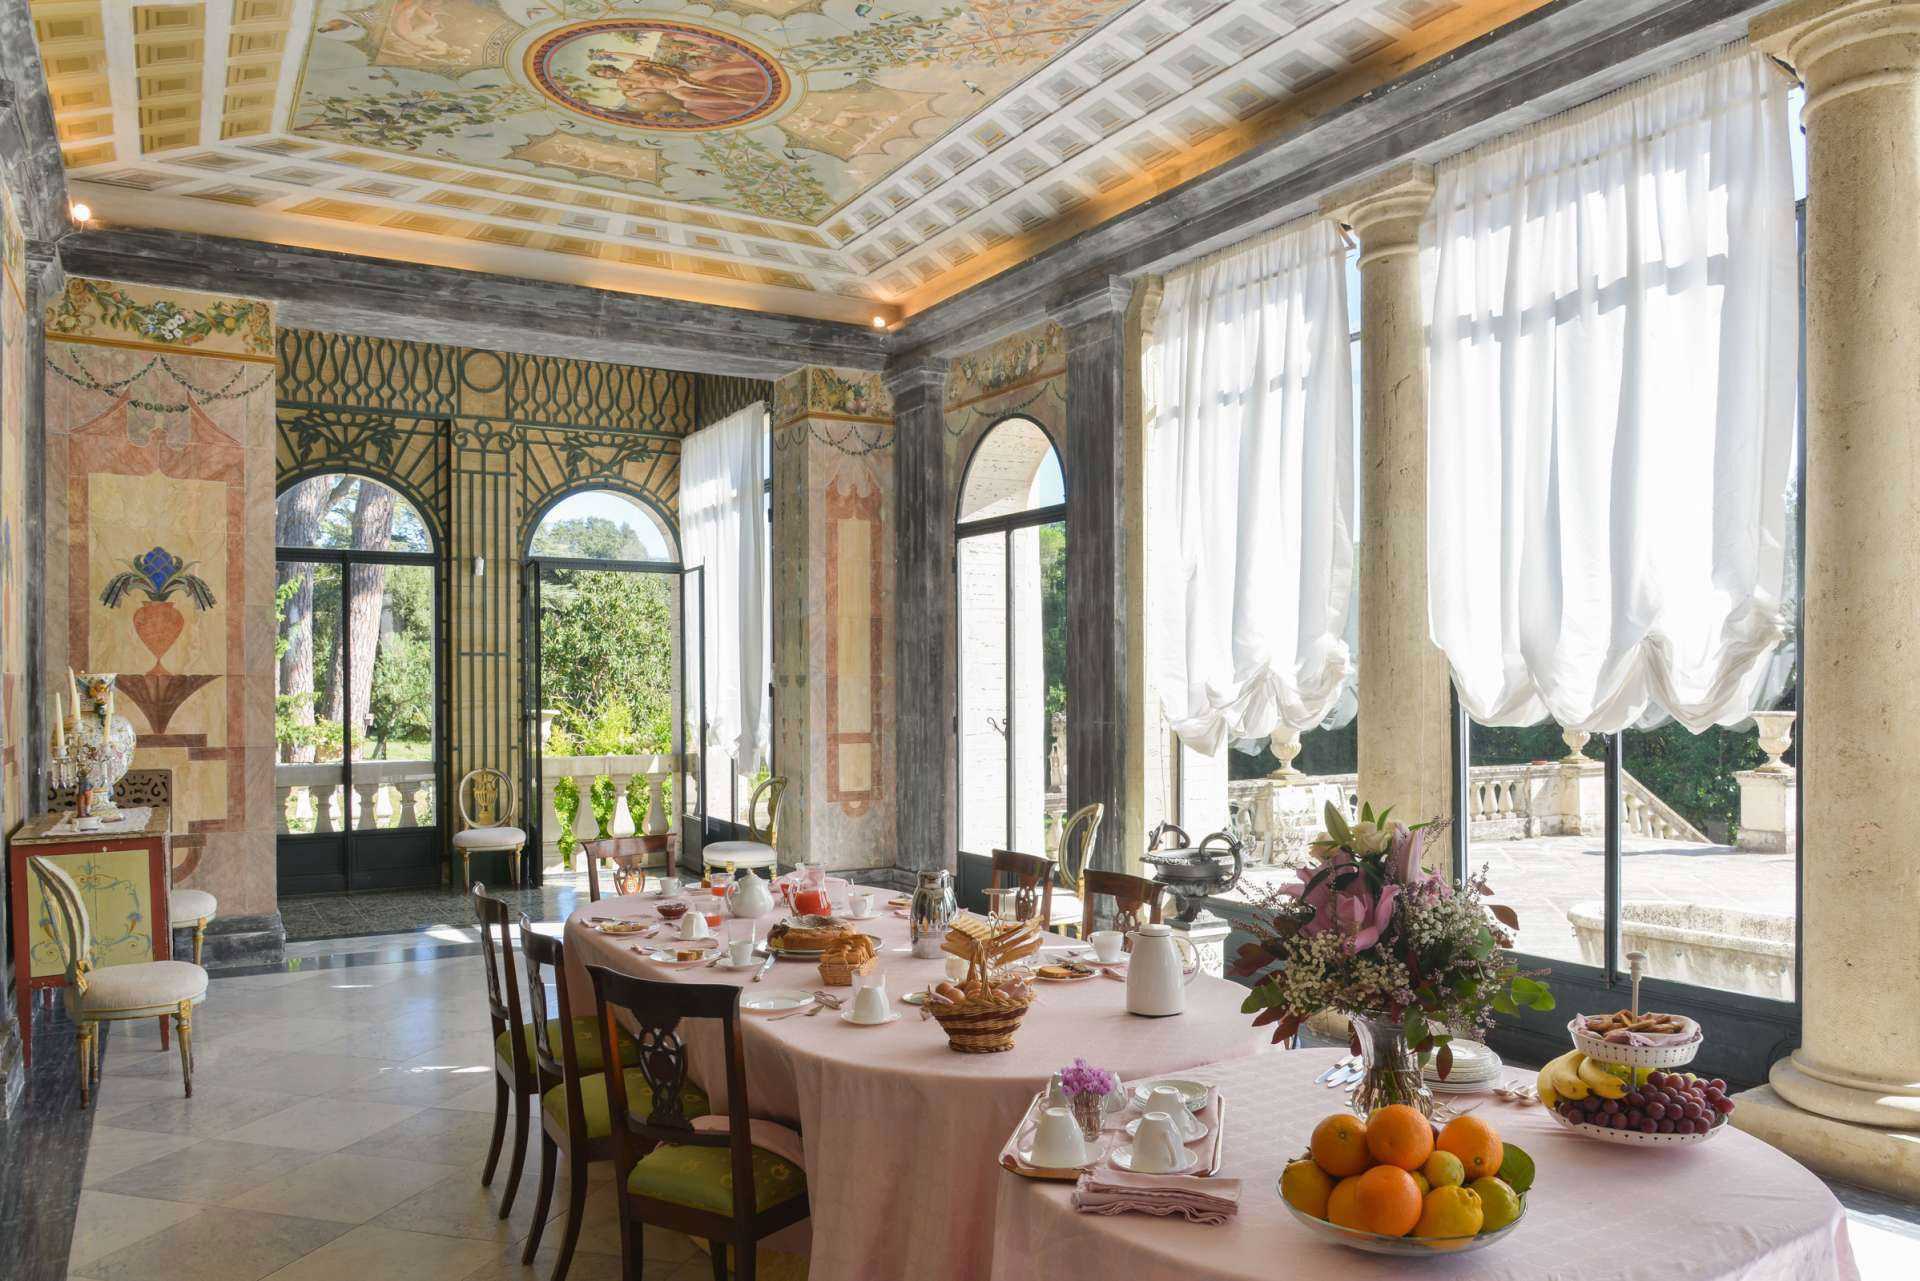 Eating Breakfast like an Italian: A Food Guide from Caffè Latte to Cornetto.